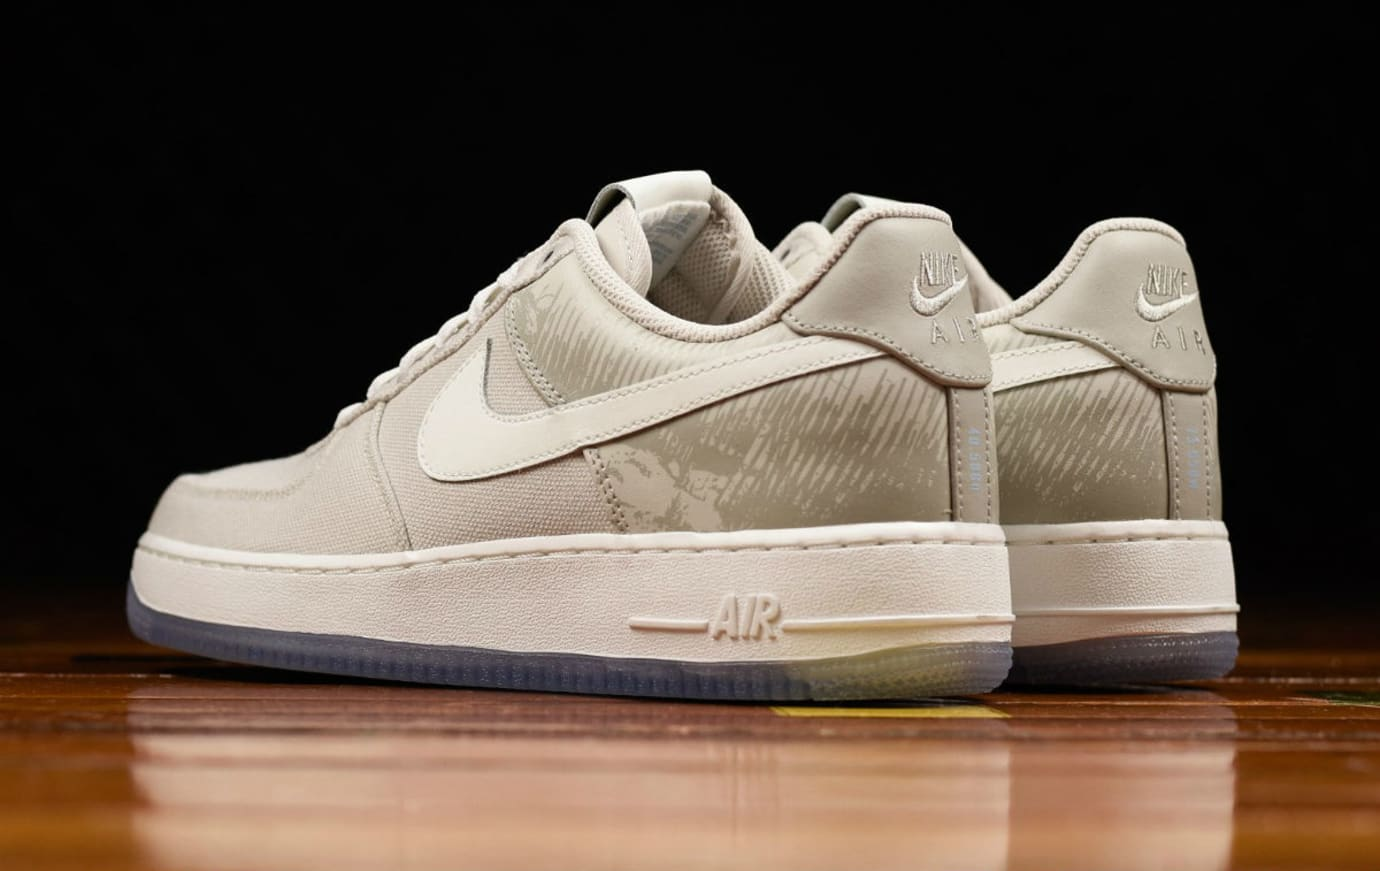 Nike Air Force 1 Low Jones Beach 2017 Retro Heel 845053-203